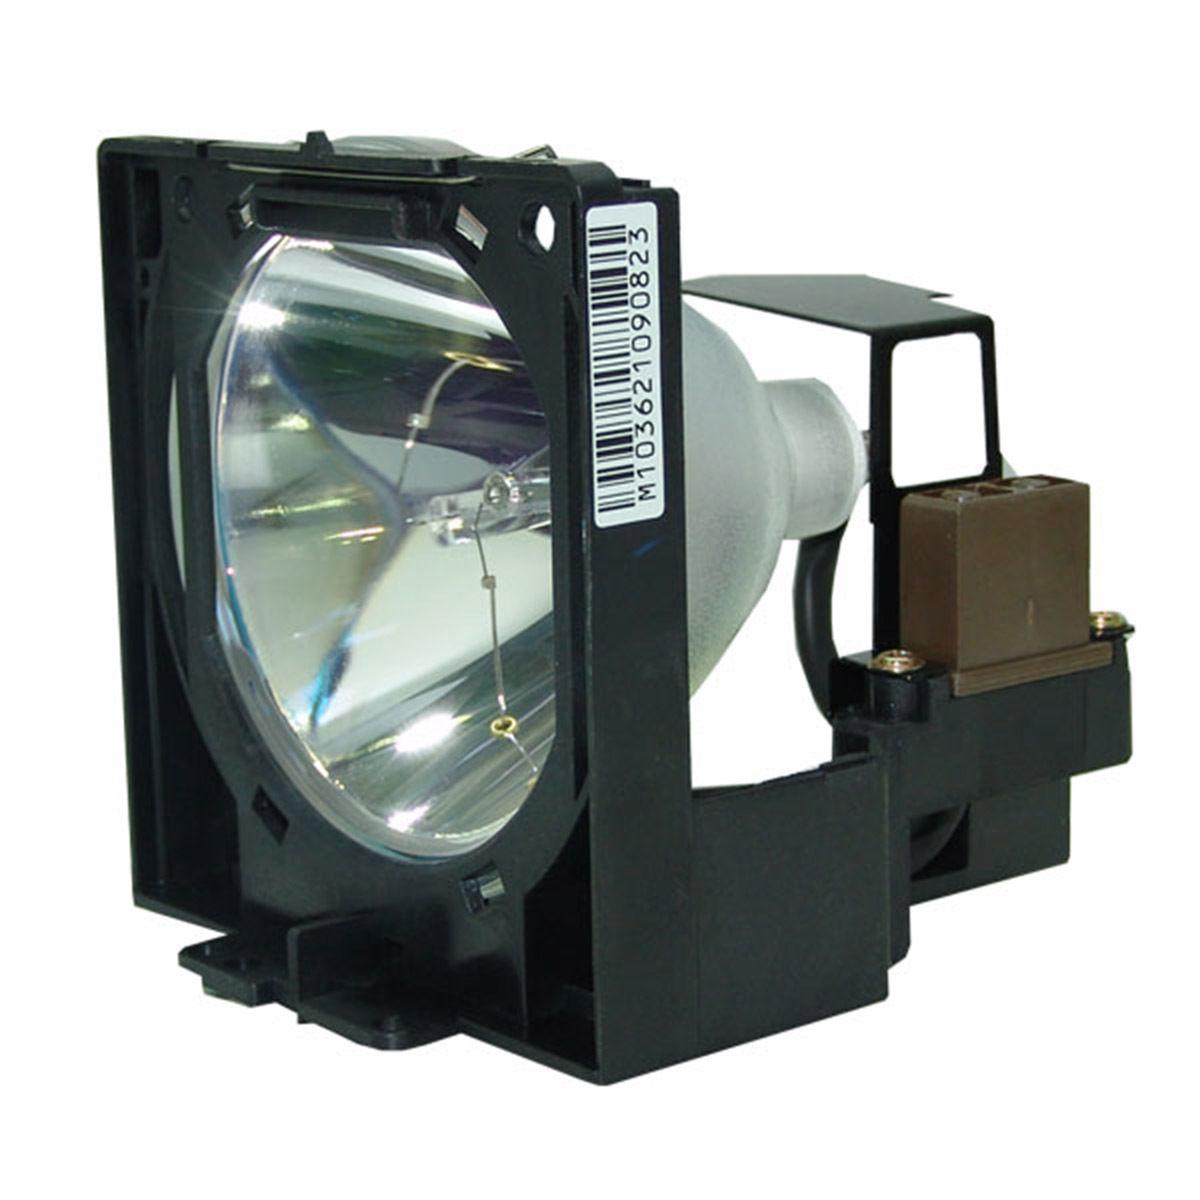 Projector Lamp Bulb POA-LMP18 LMP18 610-279-5417 for SANYO PLCSP20 PLC-XP07 PLC-XP10A PLC-XP10BA PLC-XP10EA PLC-XP10NA With Case replacement projector bare lamp bulb with housing poa lmp18 610 279 5417 for sanyo plc xp07 pcl sp20 plc xp10na projectors